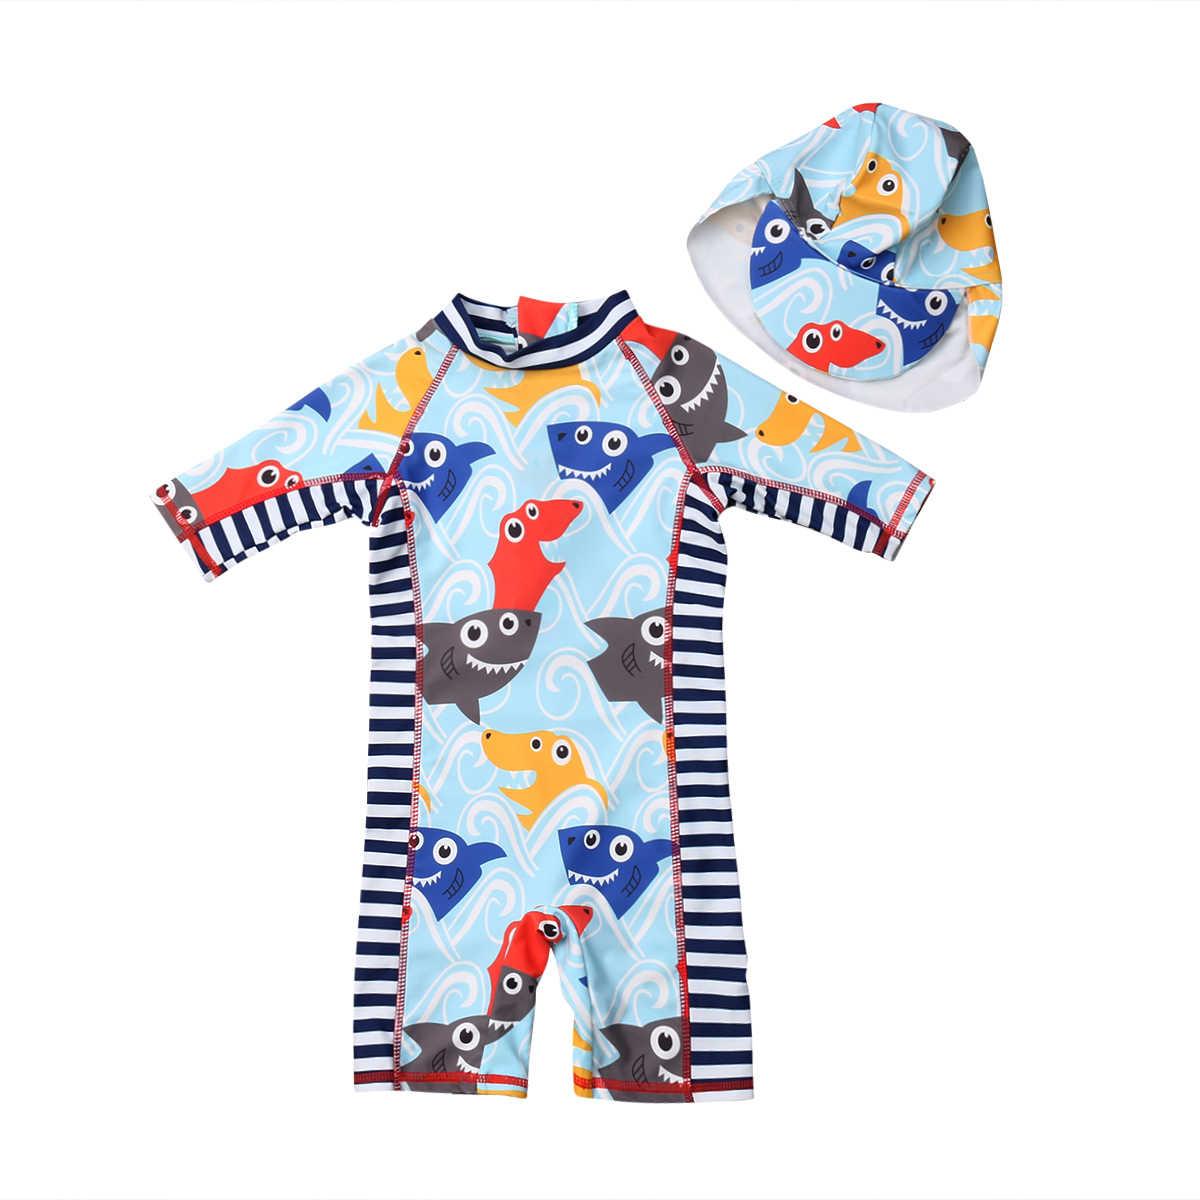 d3dfbabc72 Toddler Baby Boys Girls Cartoon Rash Guard Sun Protective Surf Beach  Swimwear Hat Swimming Suit